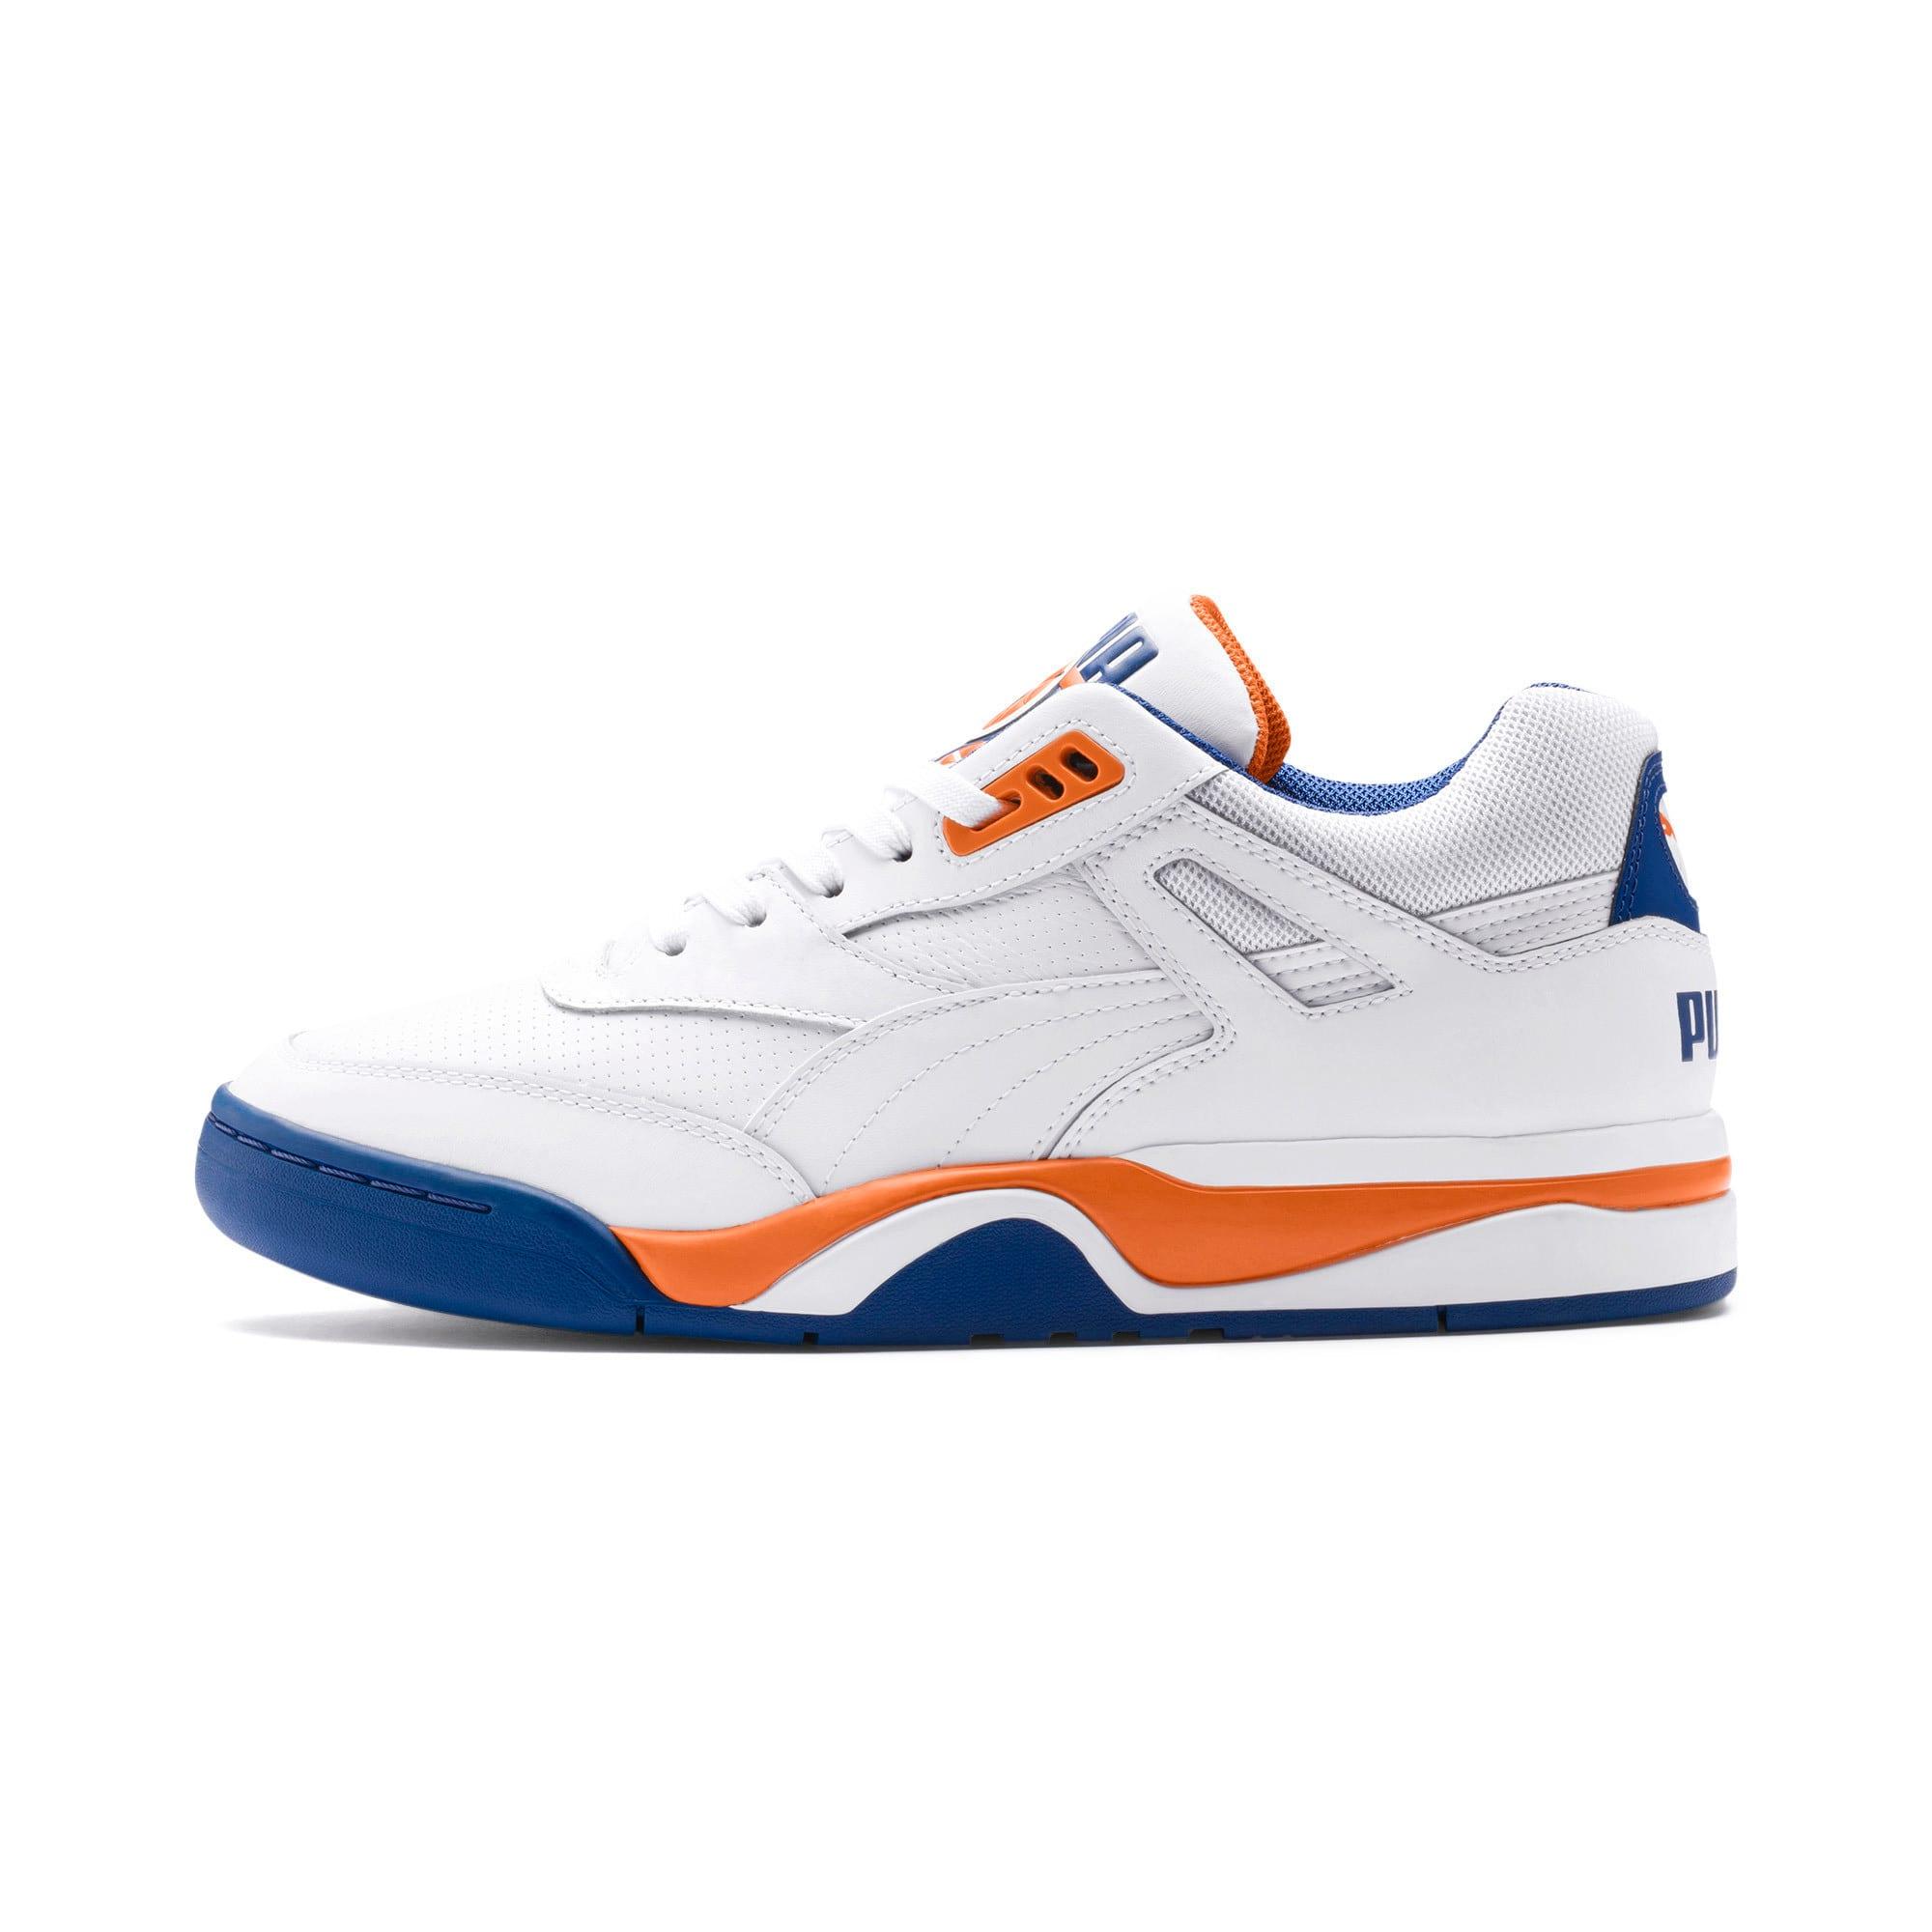 Thumbnail 1 of Palace Guard basketbalschoenen voor heren, P White-Jaffa Orange-G Blue, medium